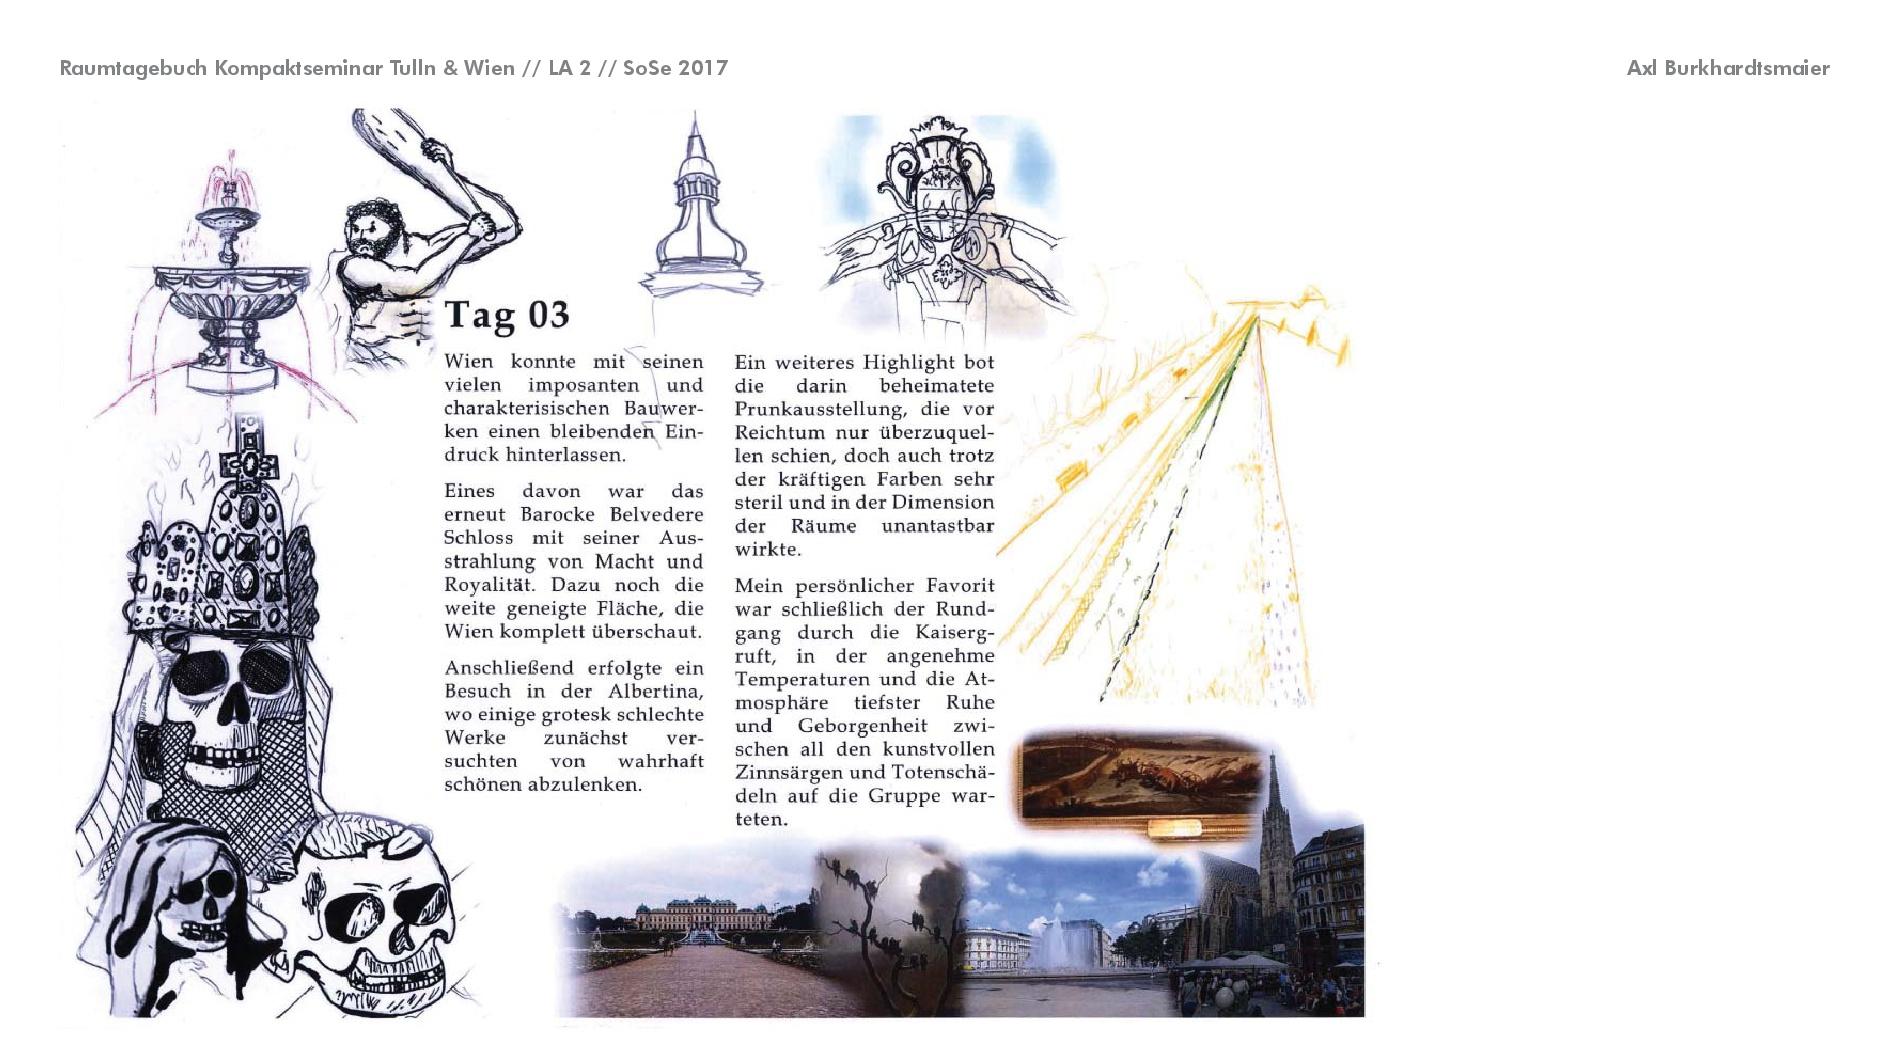 NEU Screen Raumtagebuch Tulln Wien SoSe 17 044